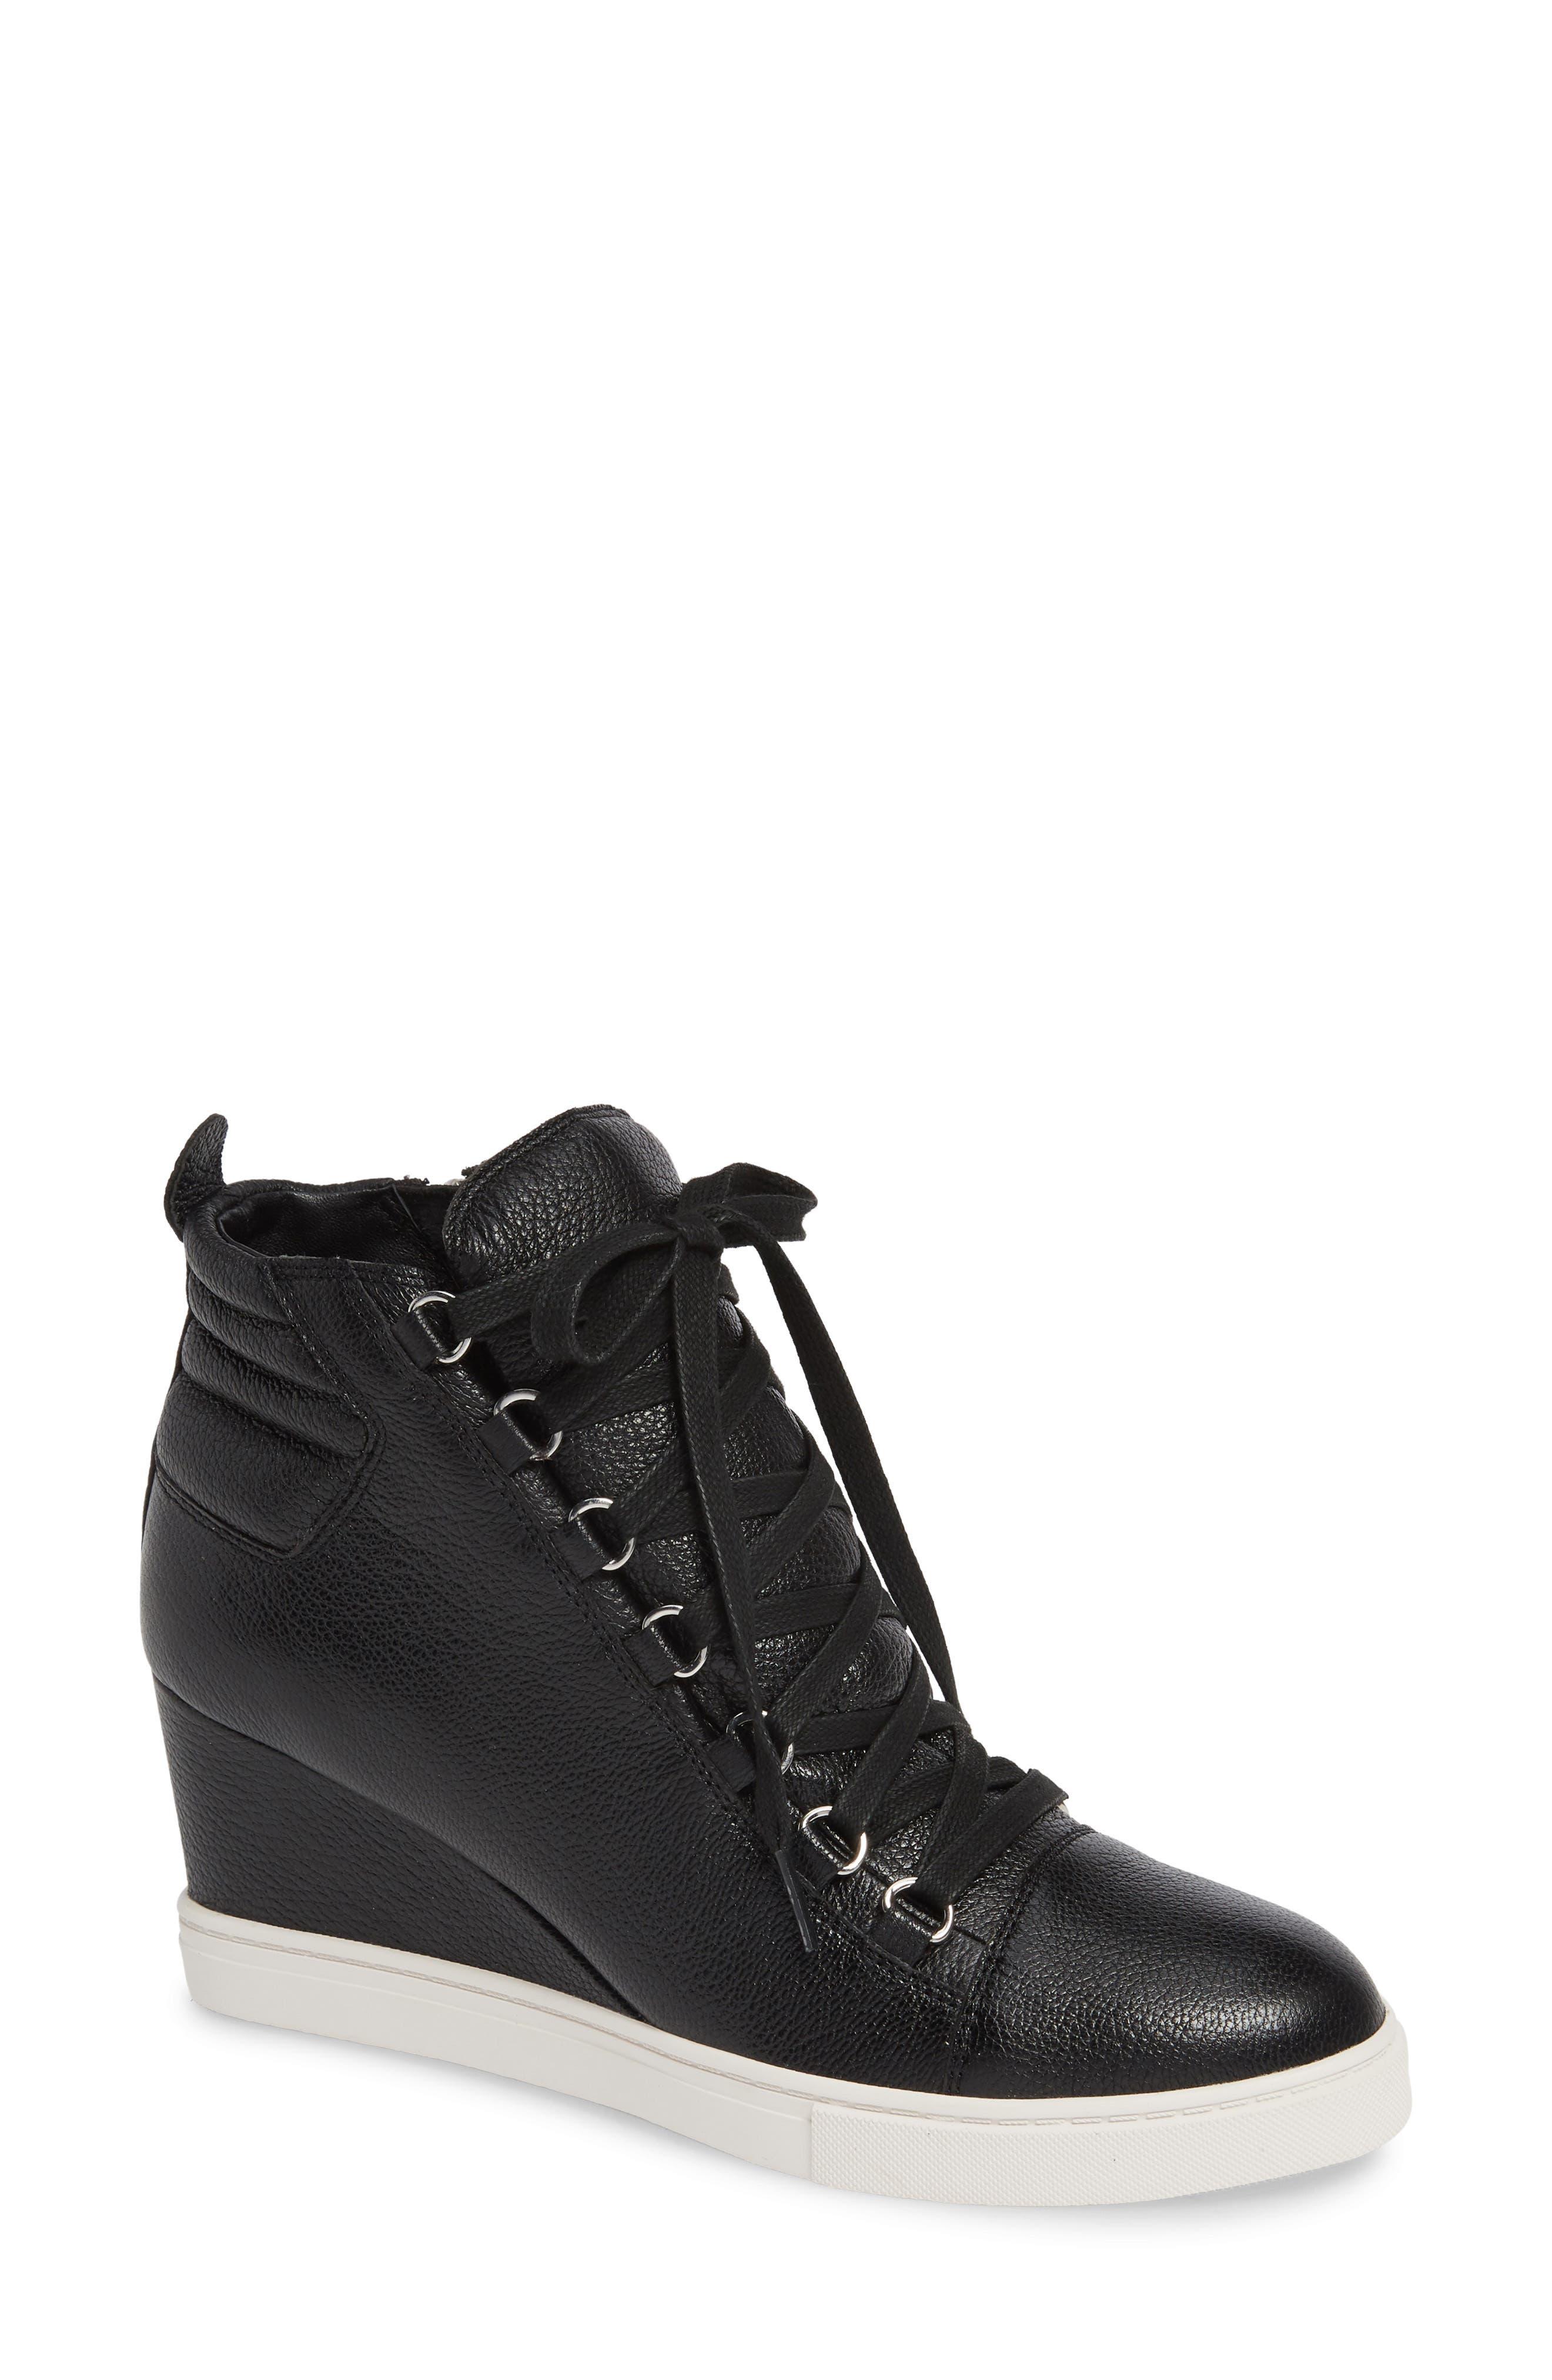 LINEA PAOLO Fenton Wedge Sneaker, Main, color, BLACK TUMBLED LEATHER